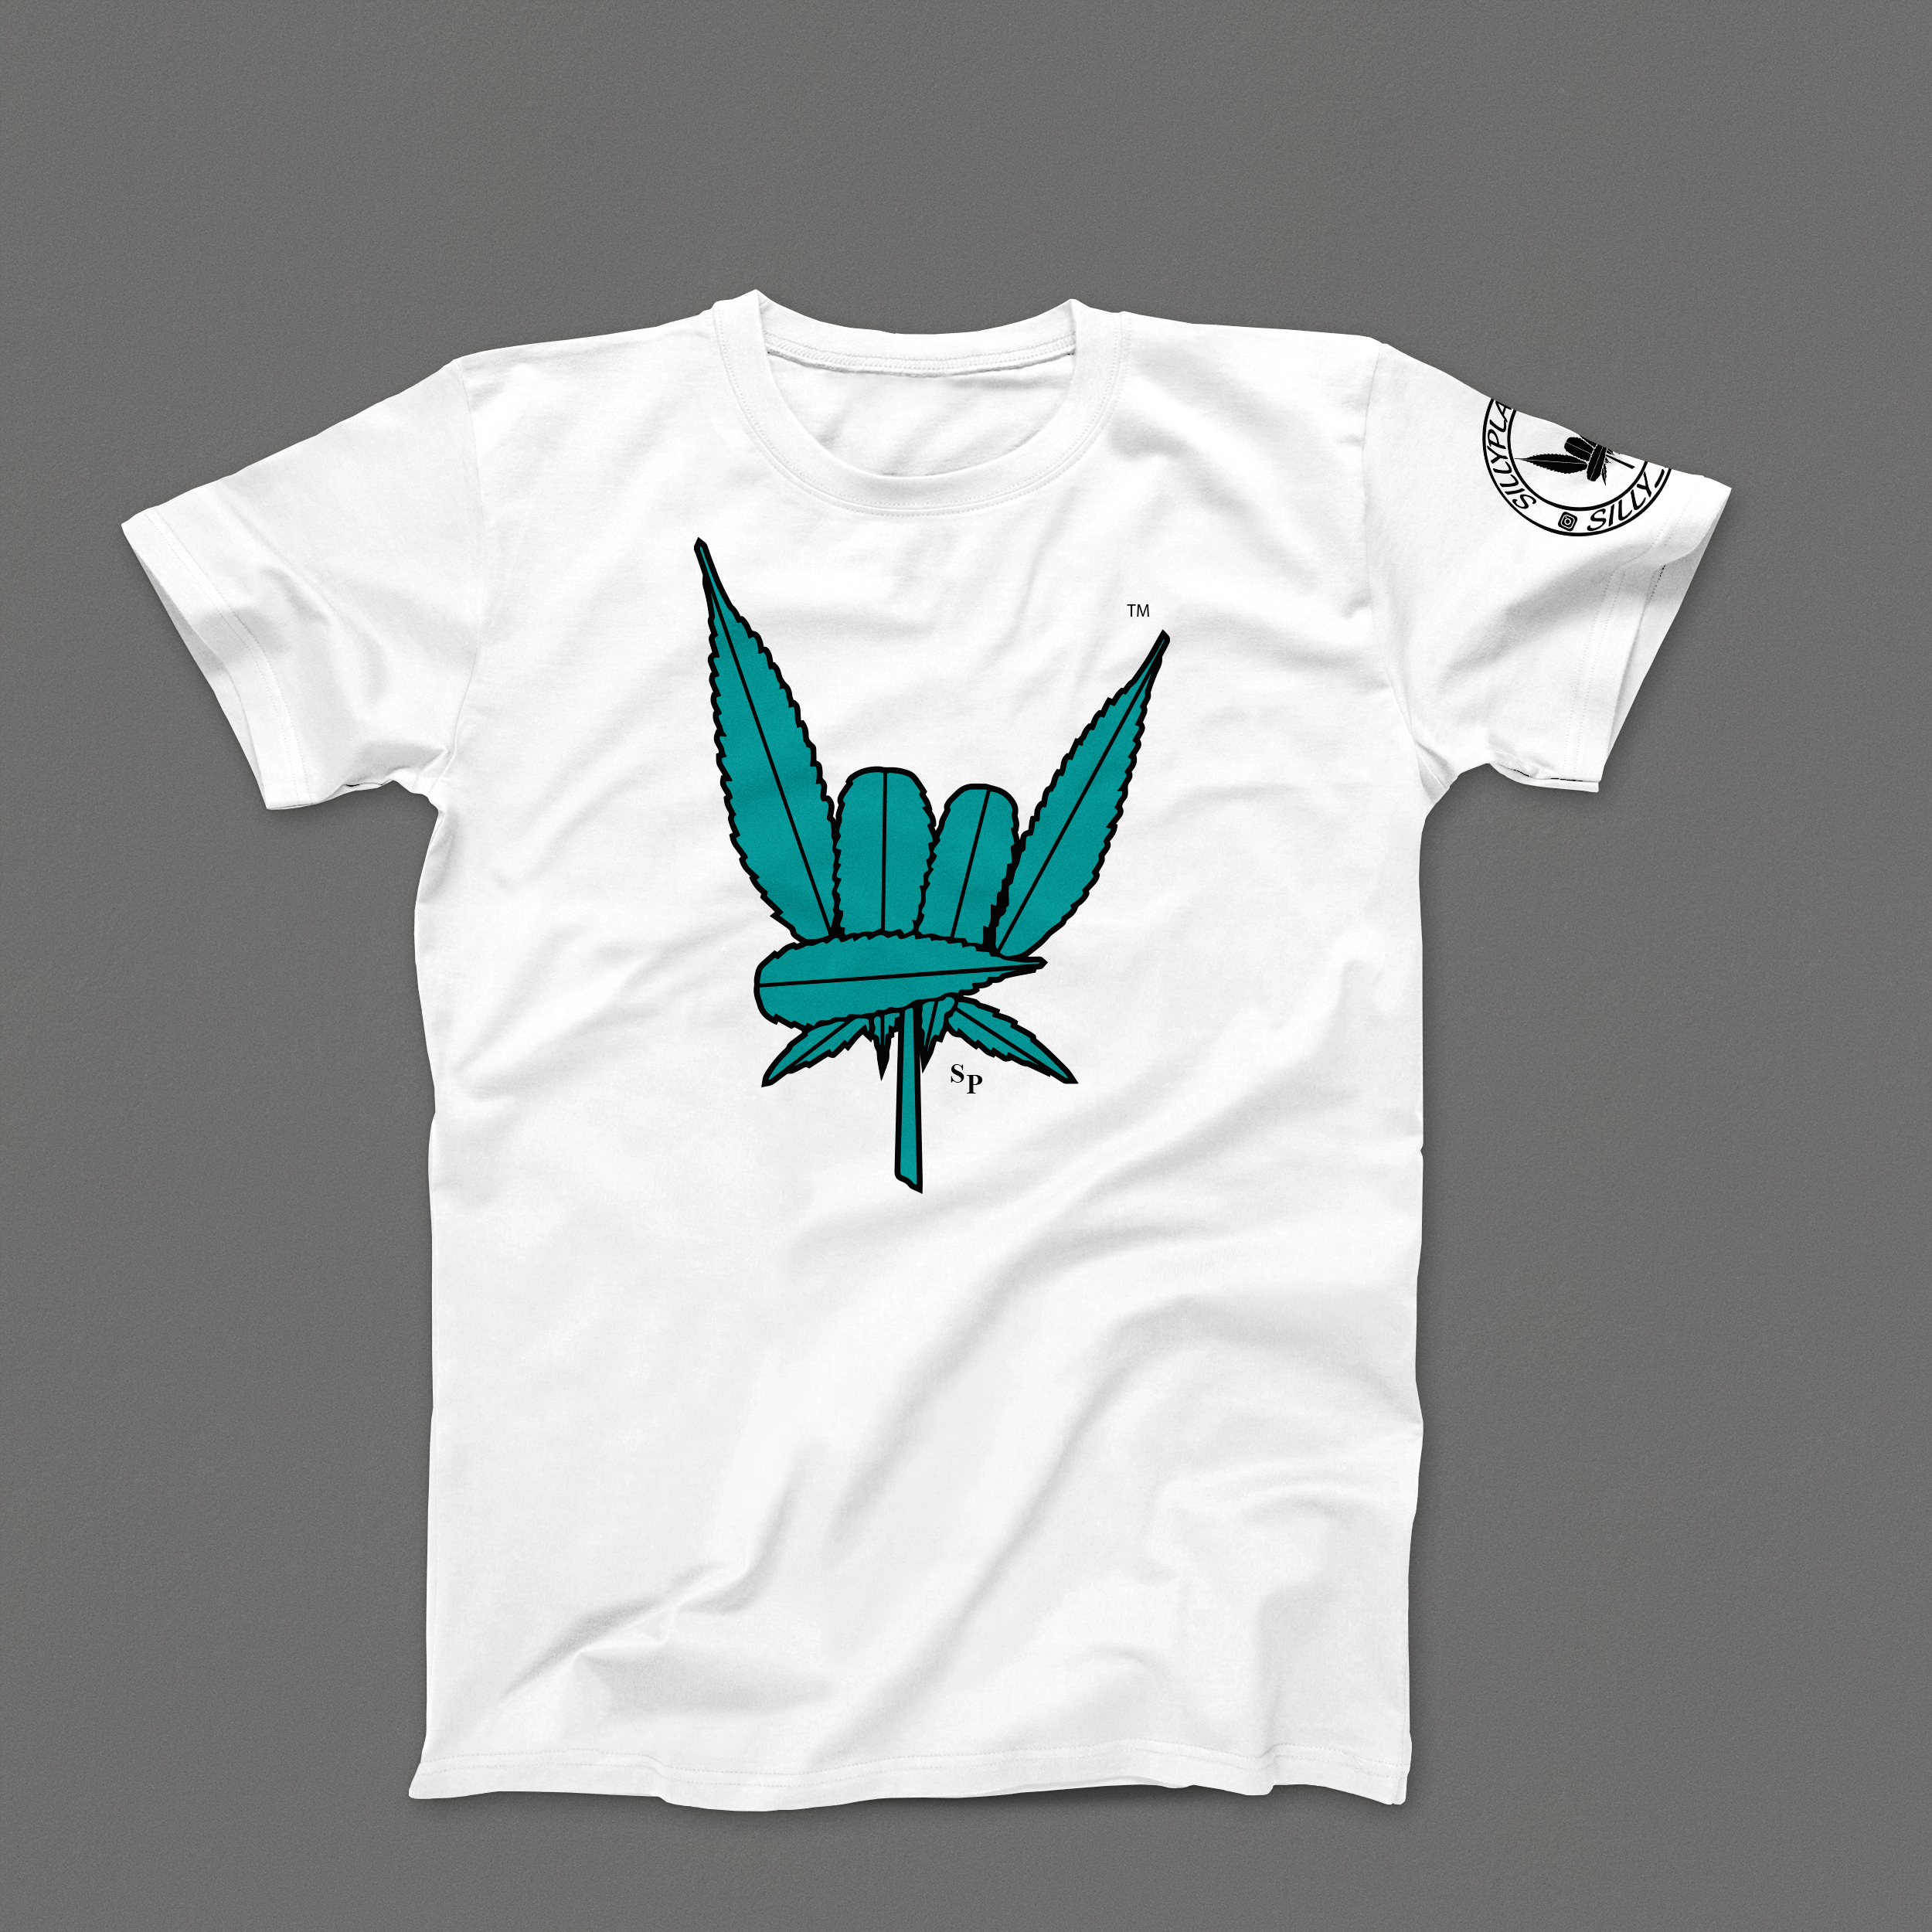 Logo Teal T-Shirt Mockup Template.jpg